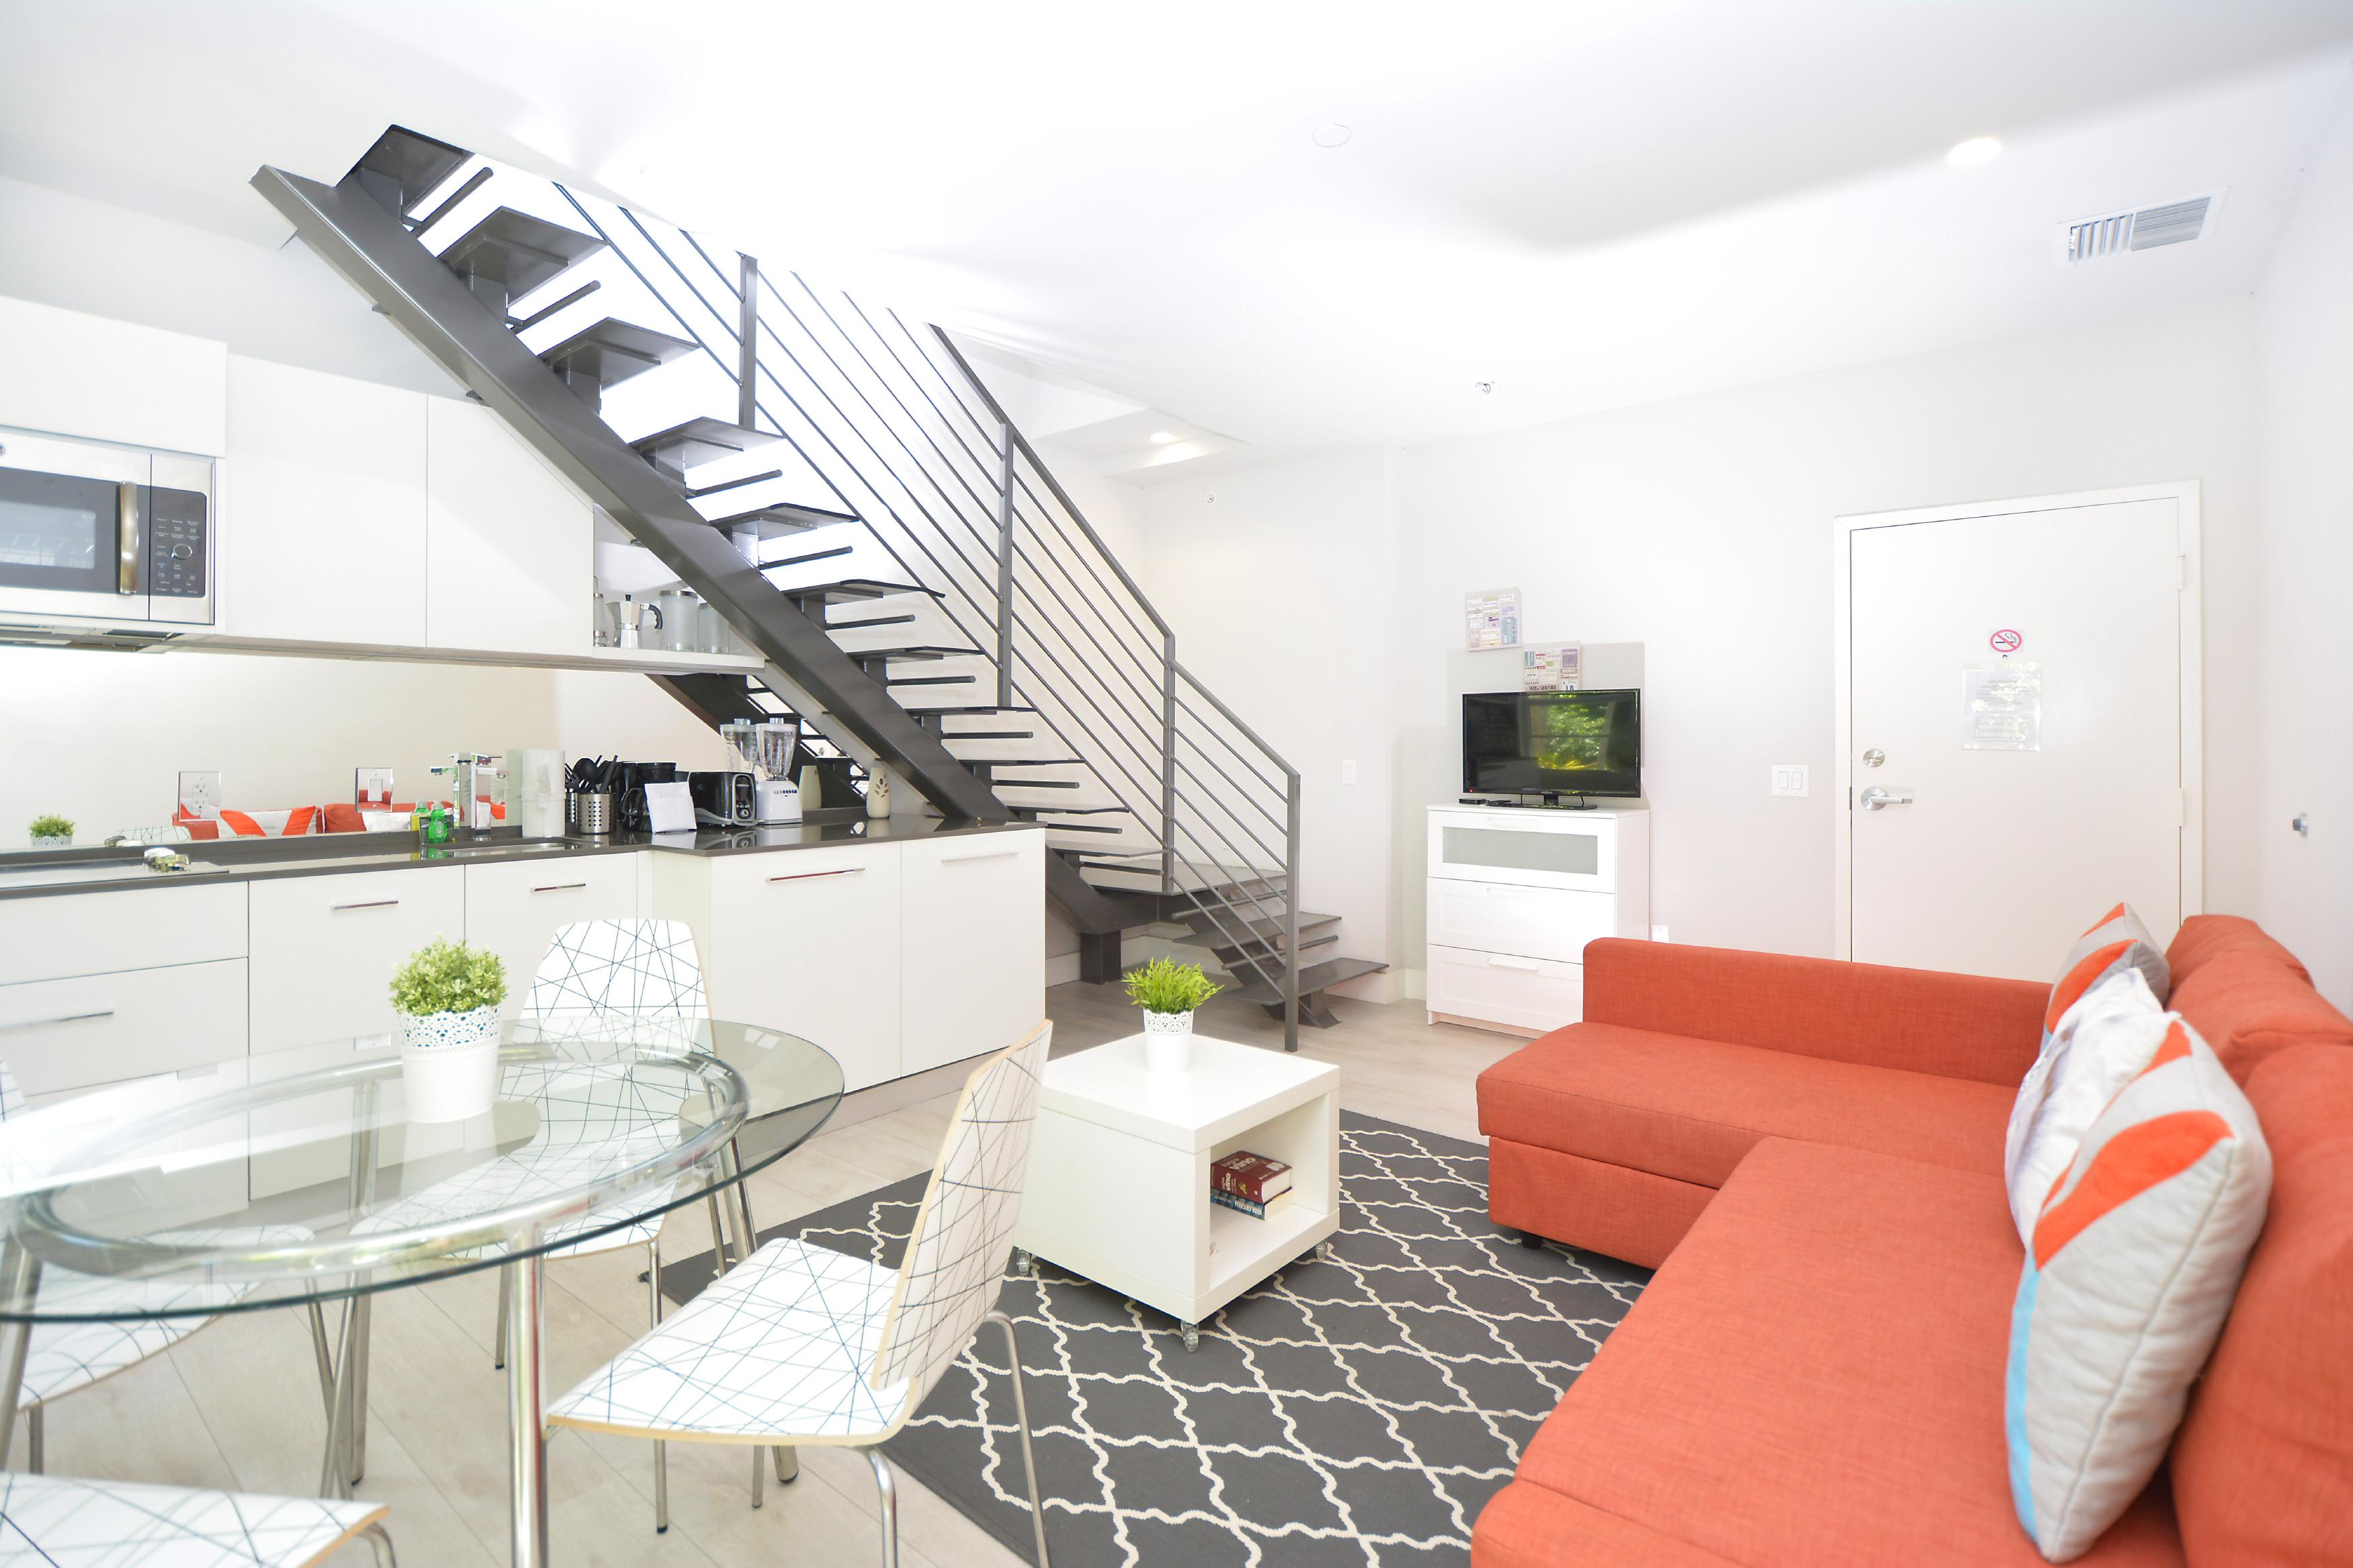 studio pensilvania Miami rental